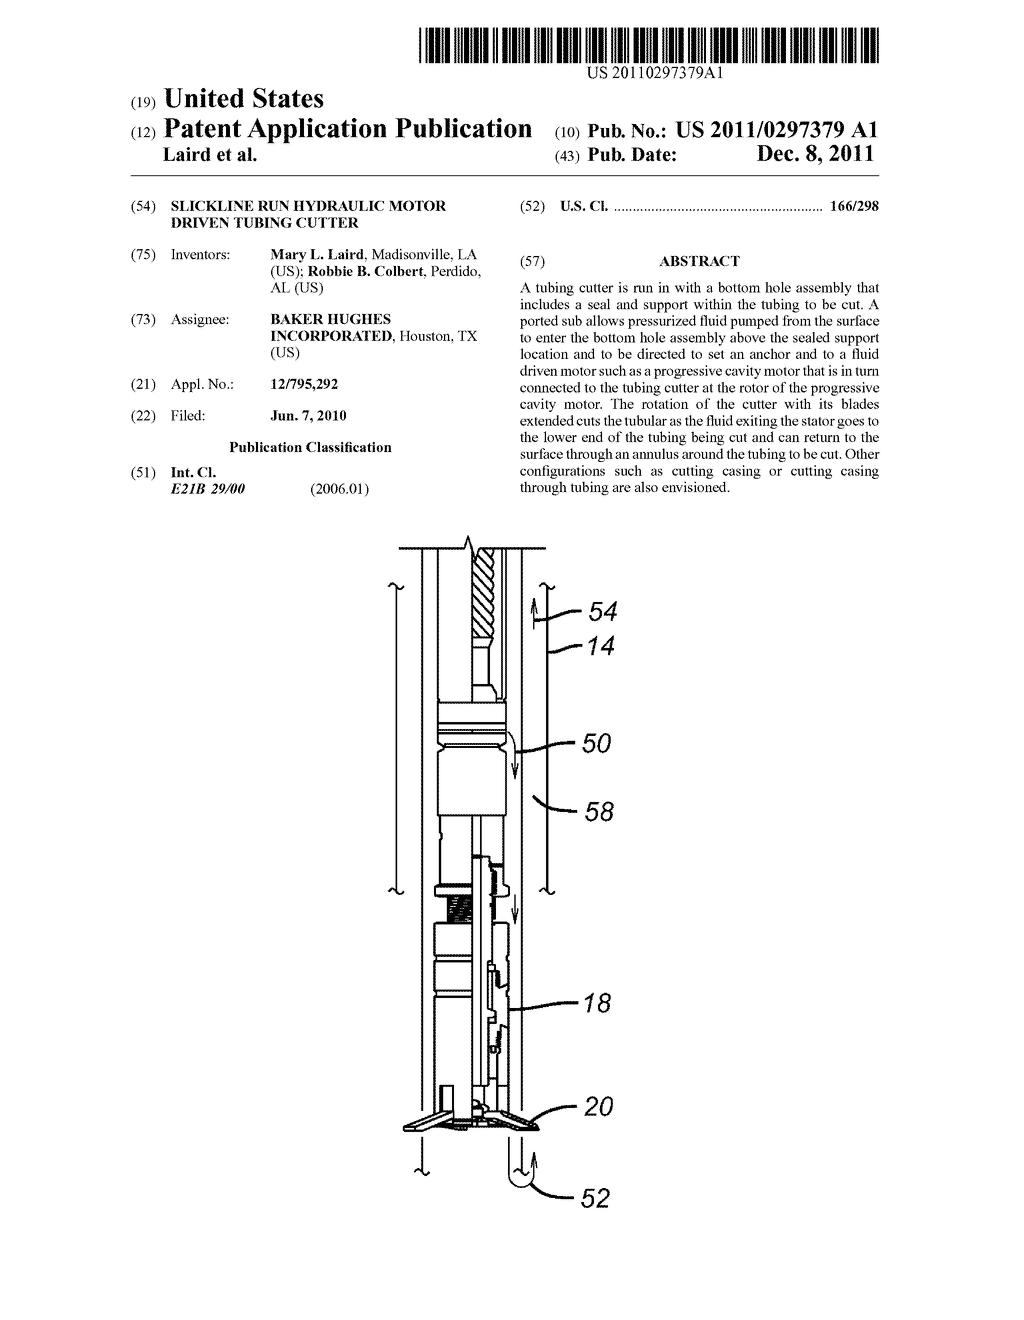 hight resolution of slickline run hydraulic motor driven tubing cutter diagram time delay relay wiring diagram circuit diagram hydraulic cutter